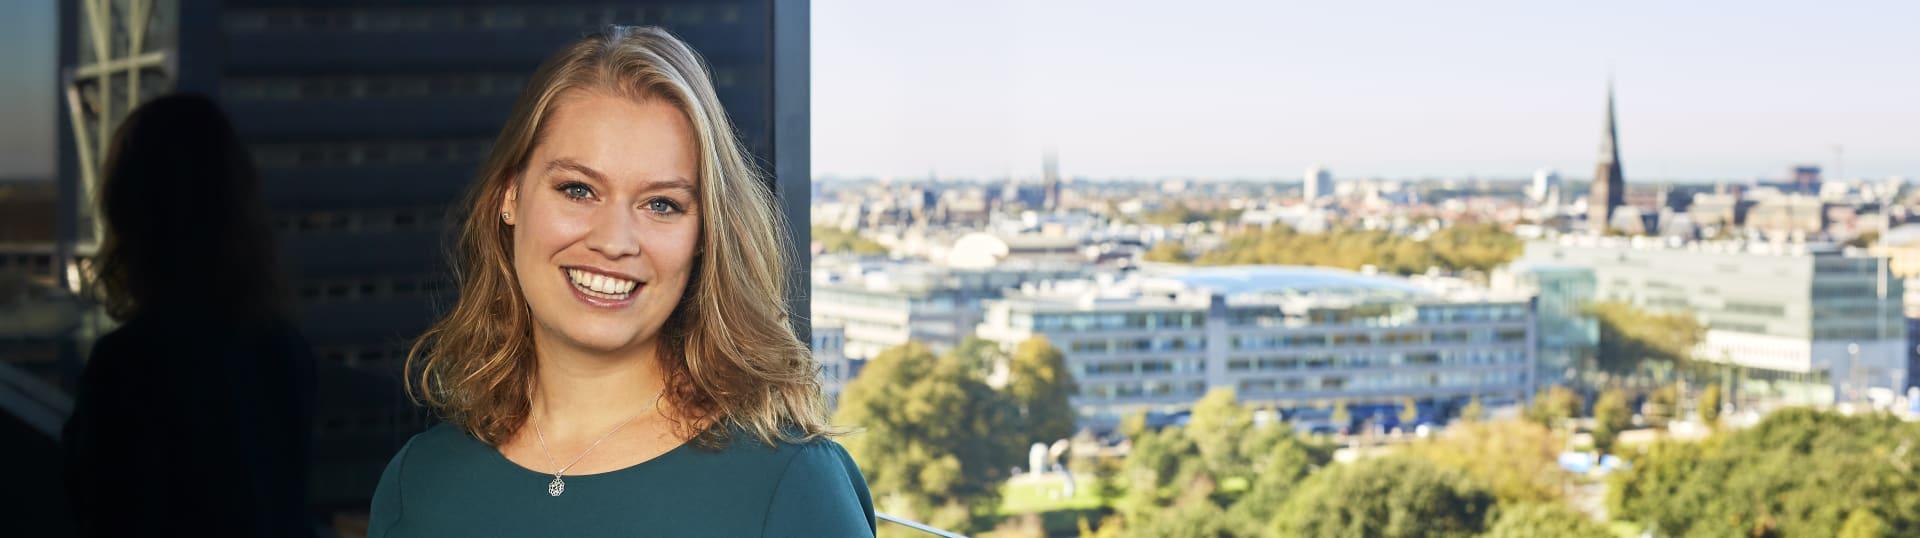 Jetske Huber, advocaat Pels Rijcken